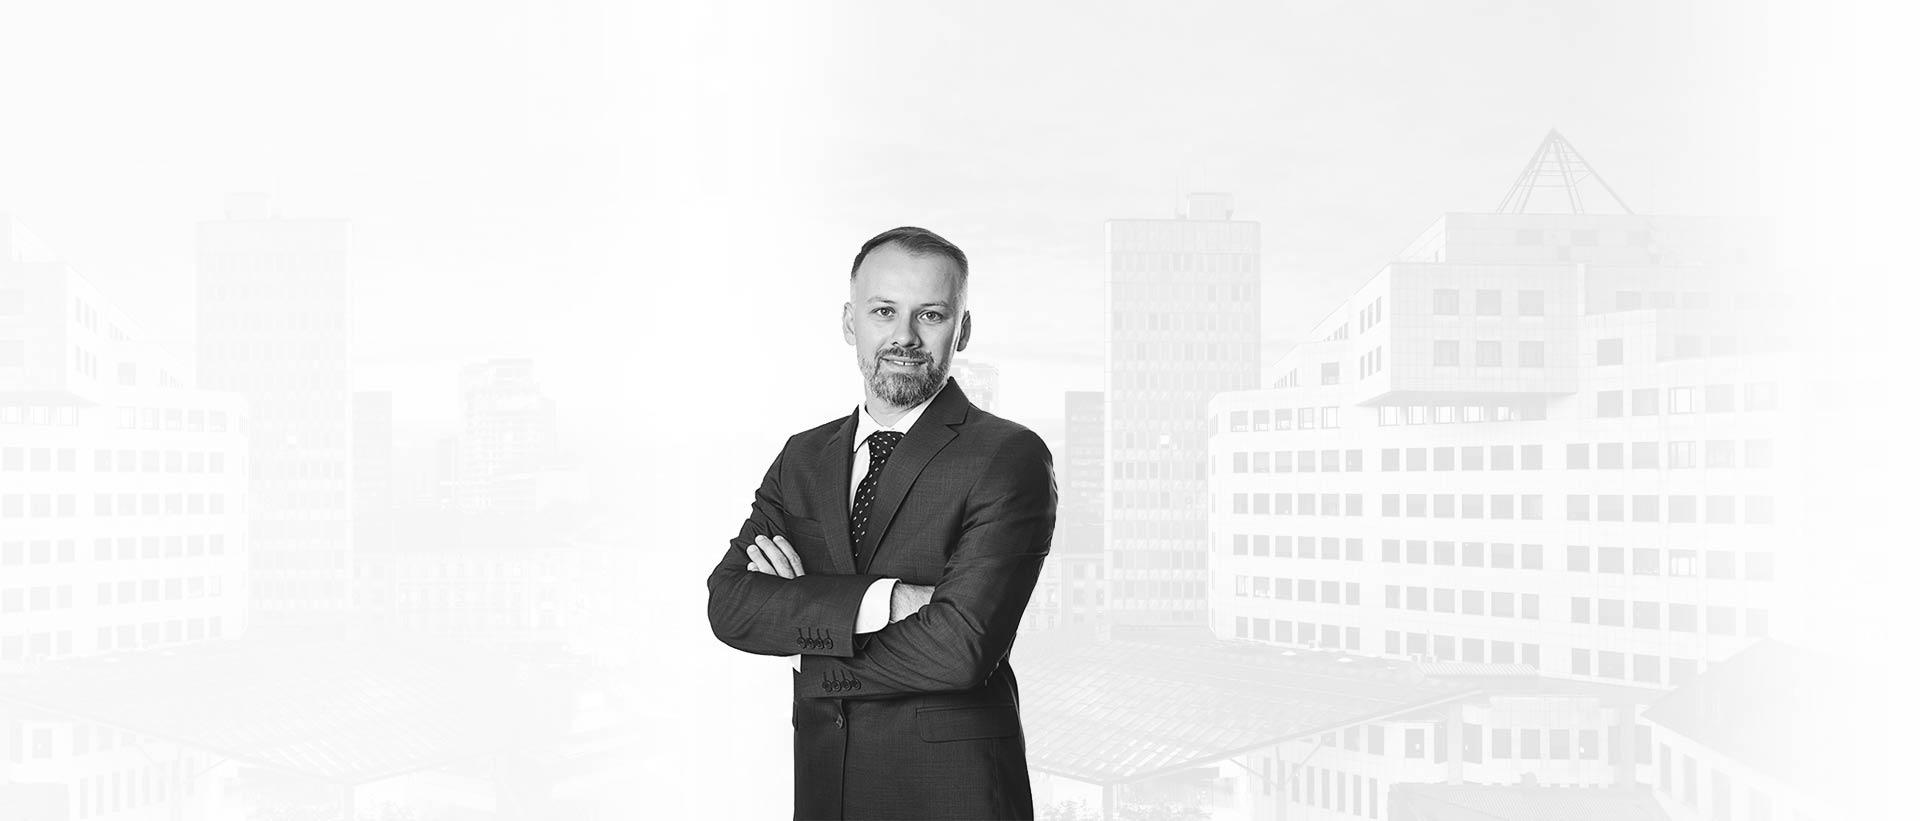 Matej Perpar